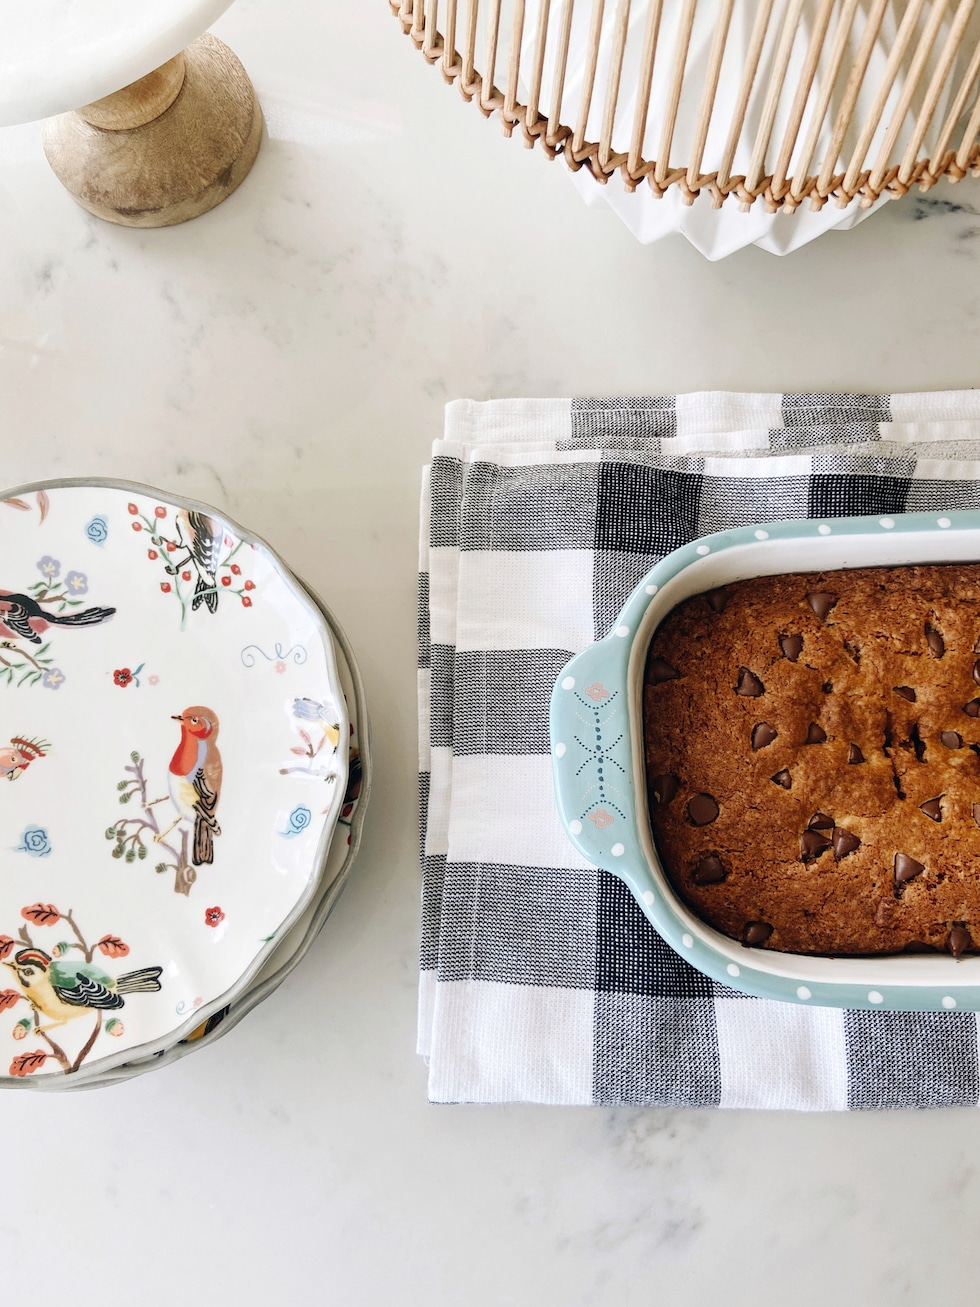 Best Gluten-Free Banana Bread Recipe (With Chocolate Chips + Walnuts)